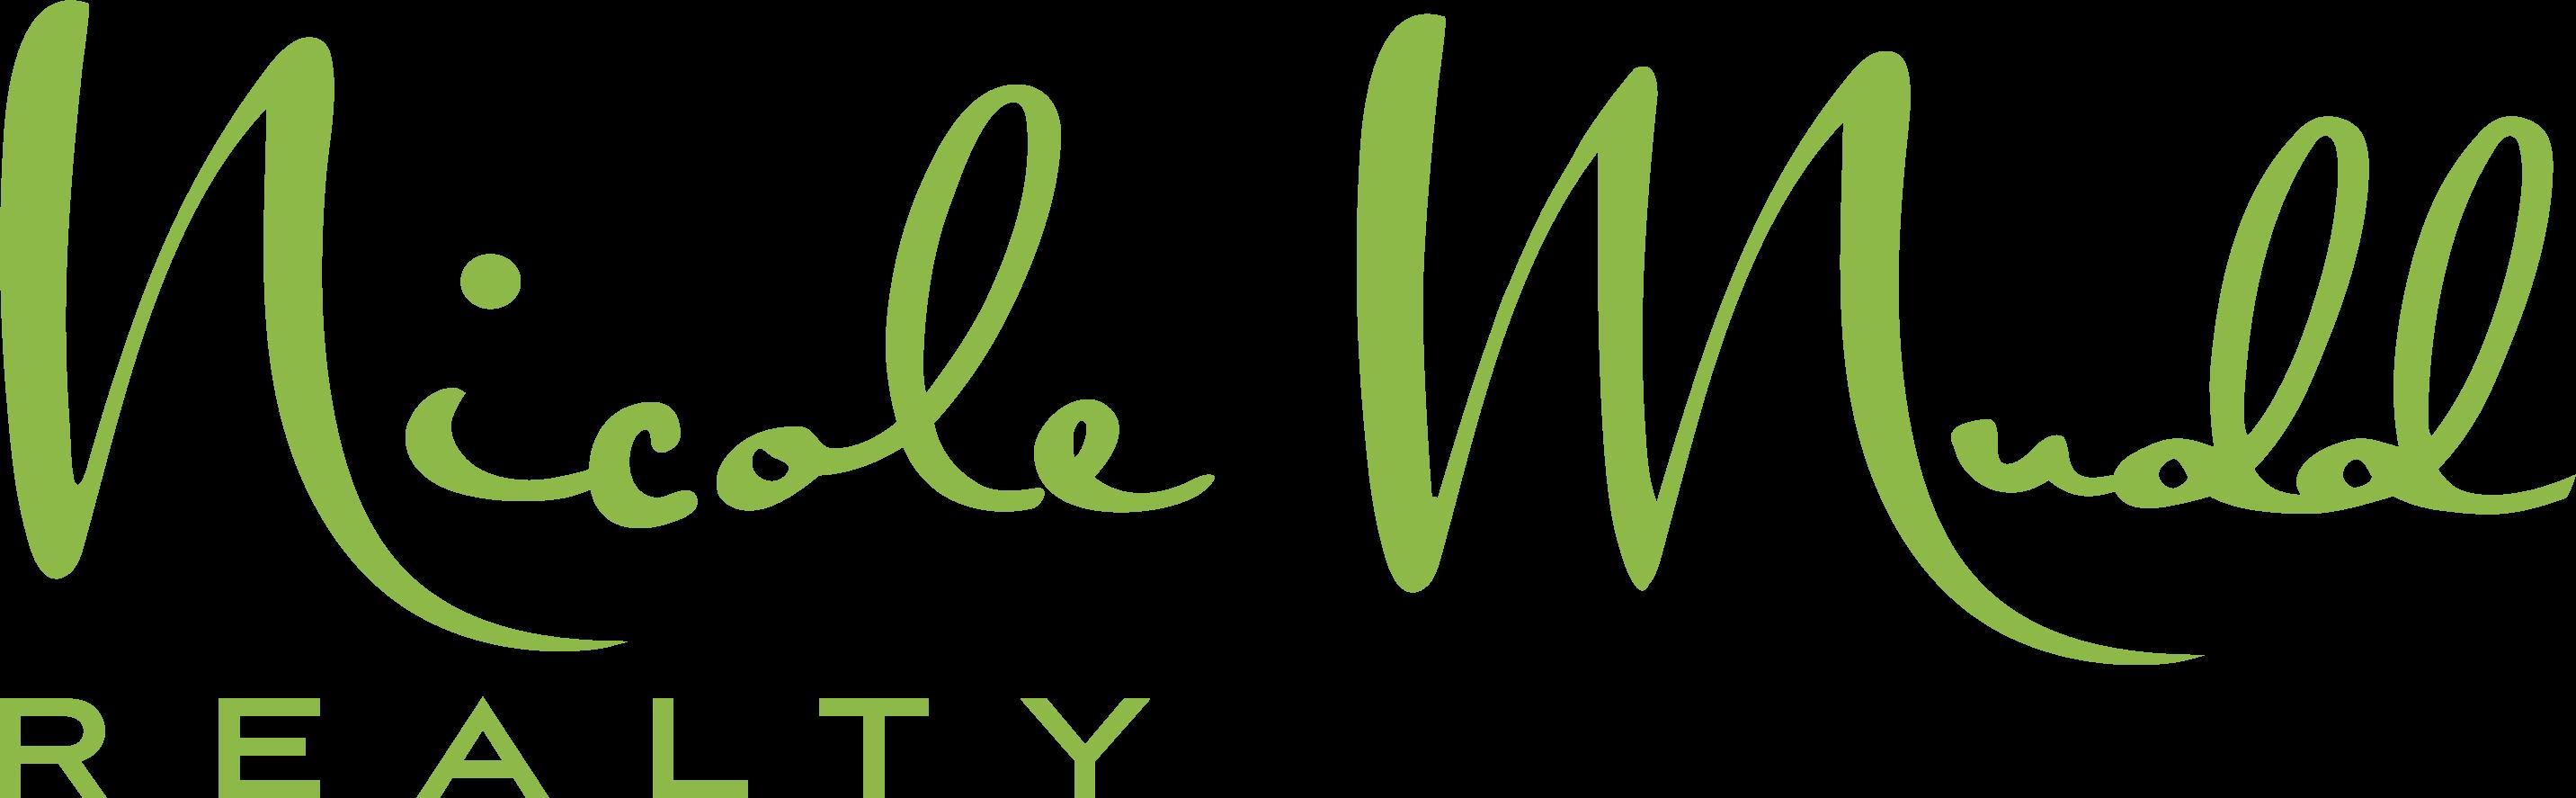 Large Nicole Mudd Realty logo - Cary Realtor